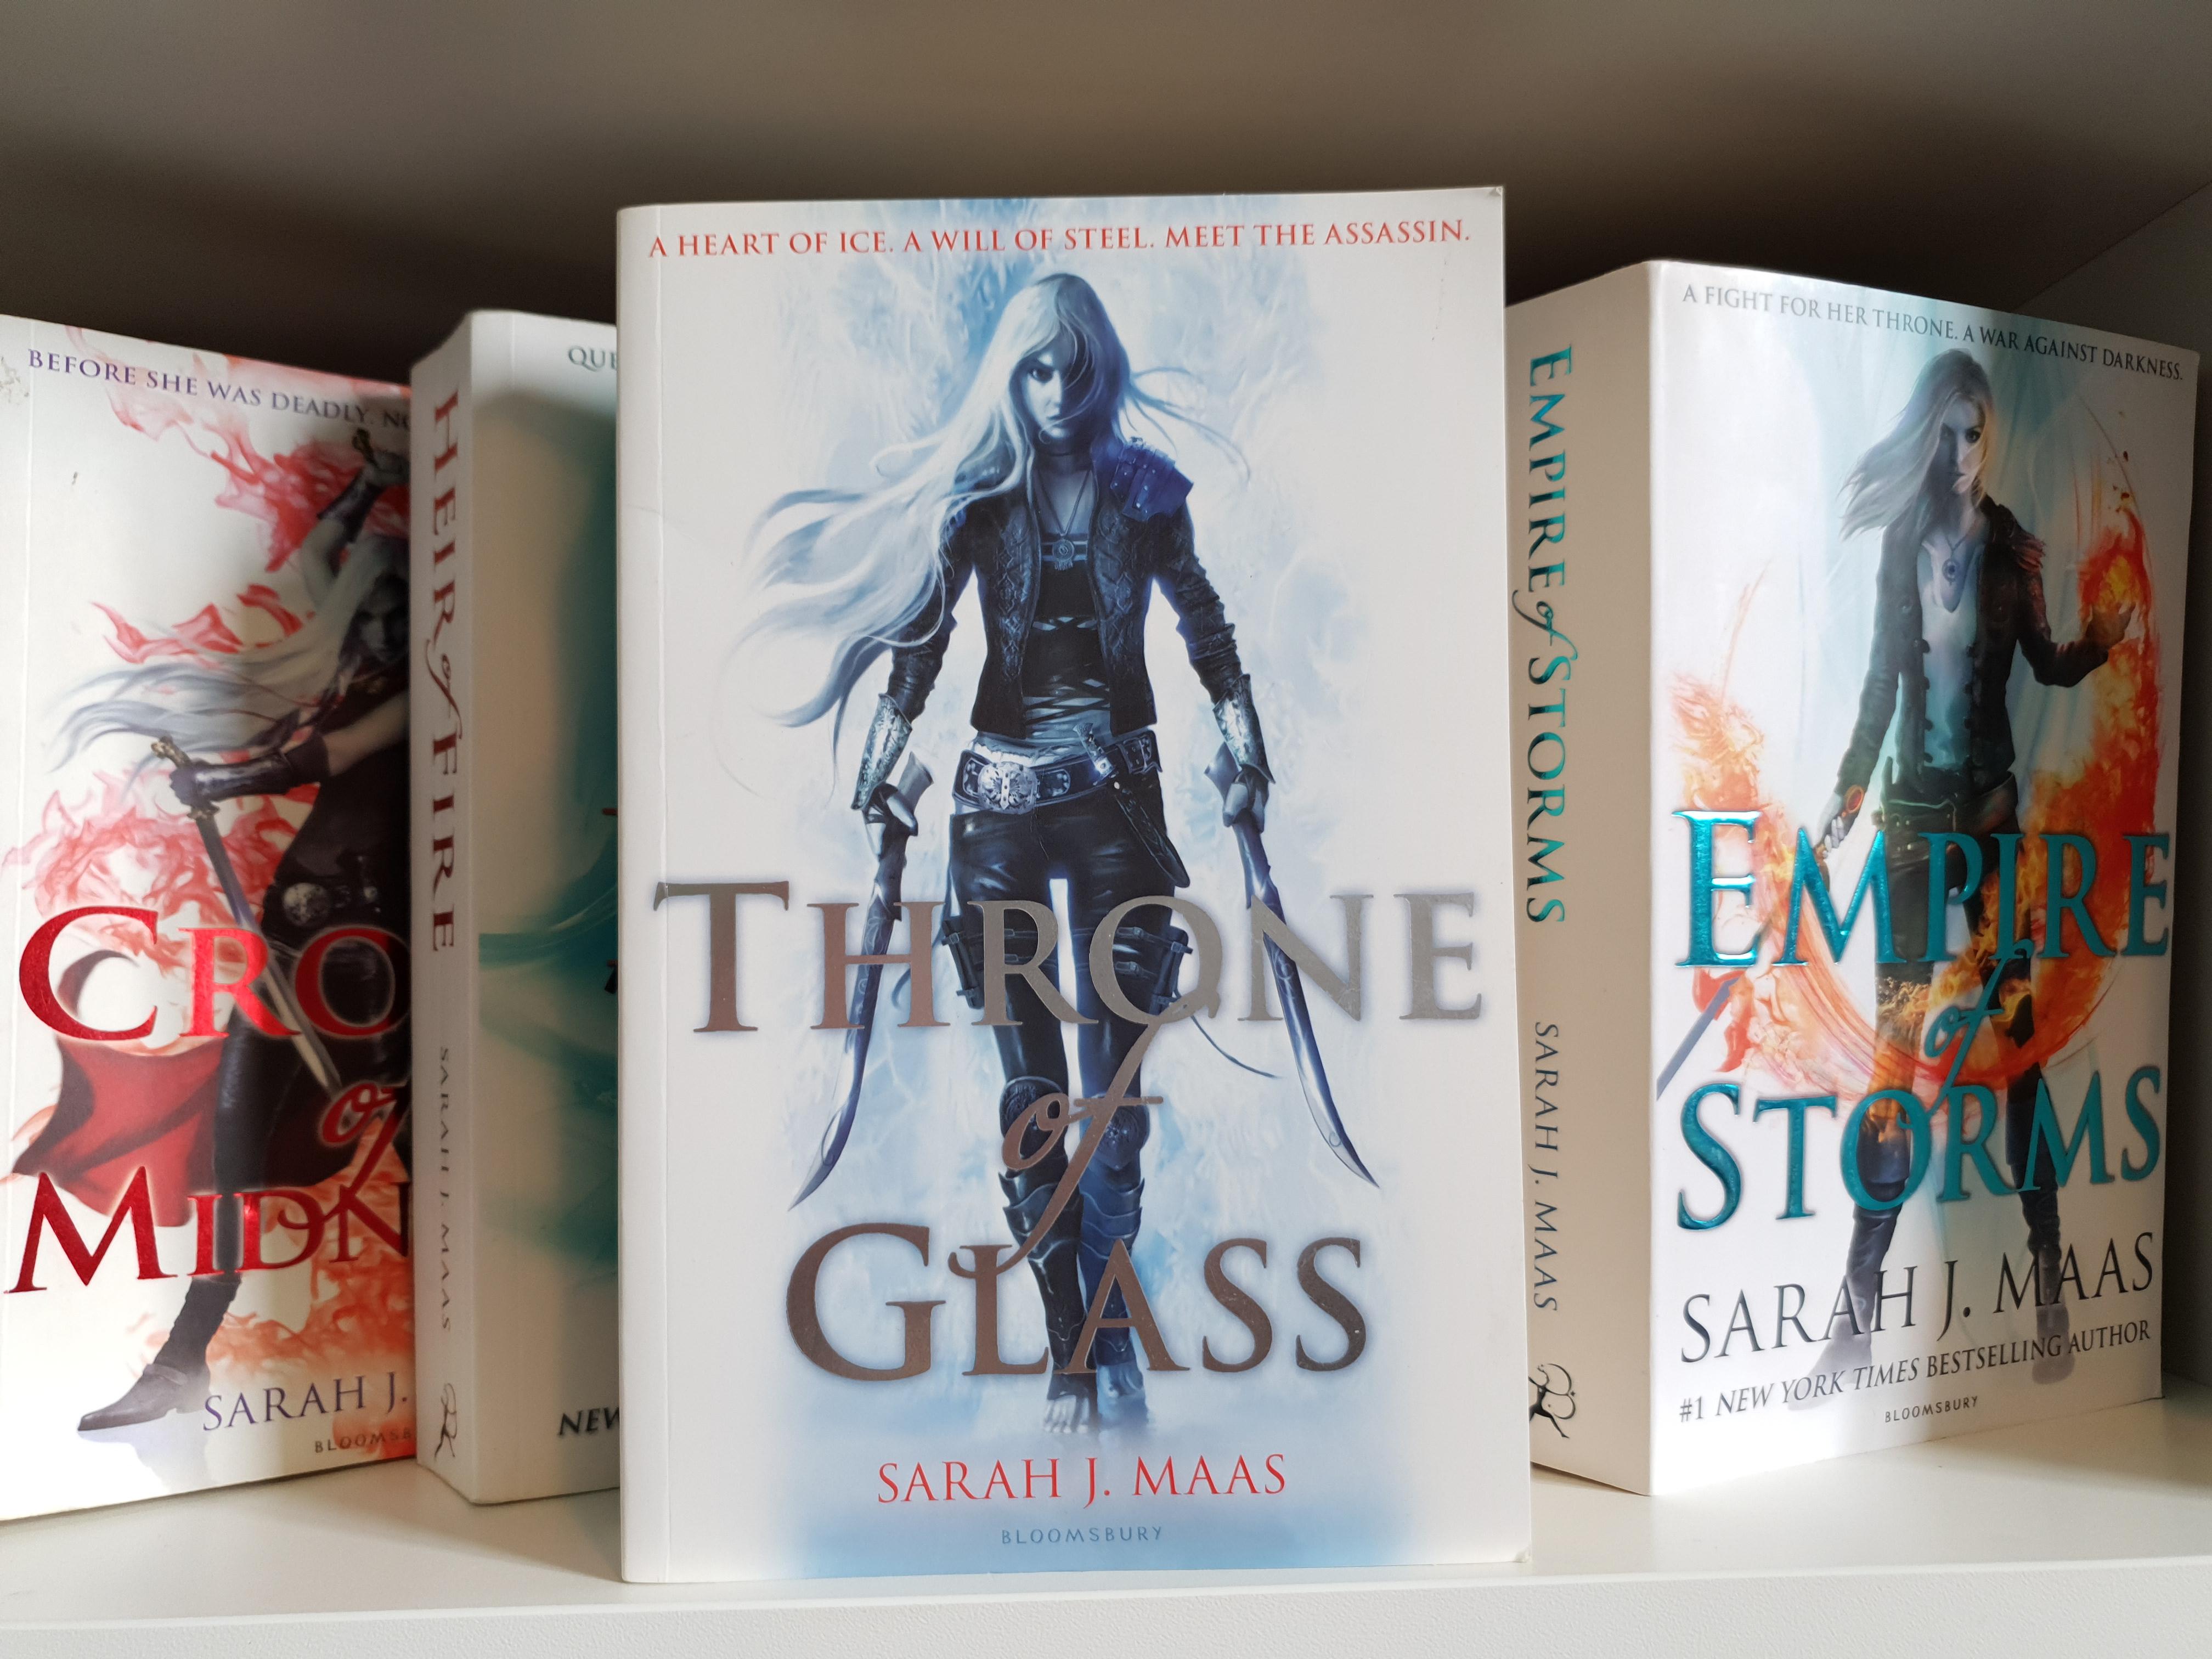 Throne of Glass by Sarah J. Maas.jpg